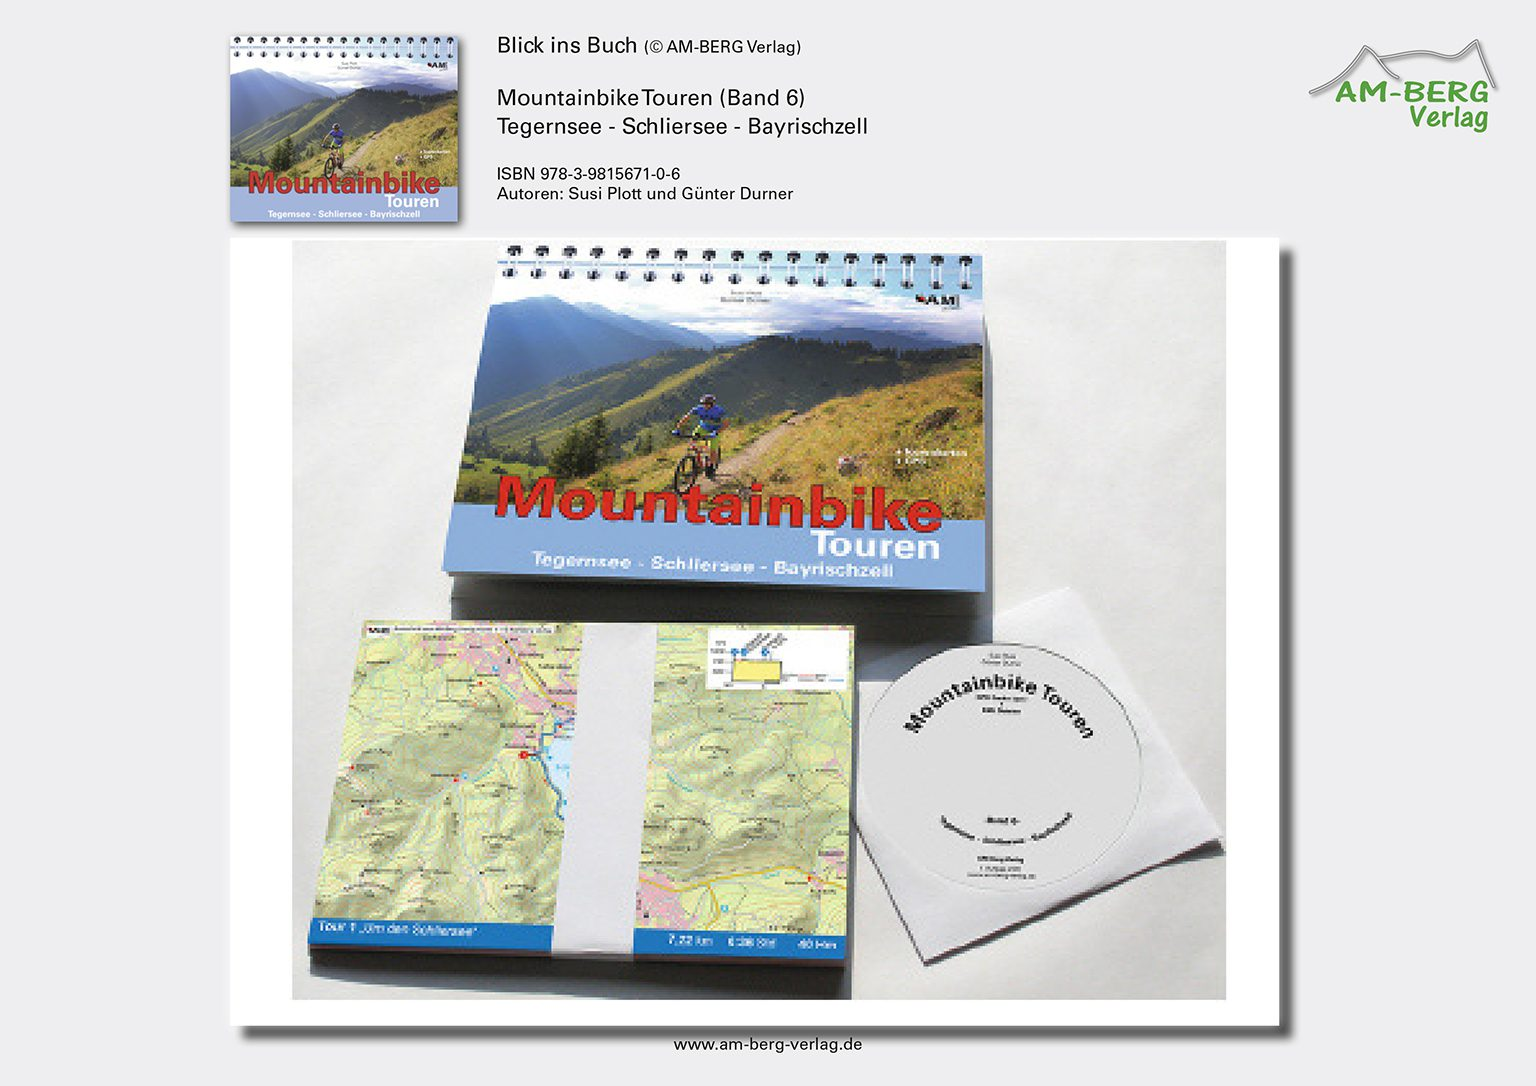 Mountainbike Touren Tegernsee-Schliersee-Bayrischzell (Band 6)_Ringbuch, Tourenkarten, CD